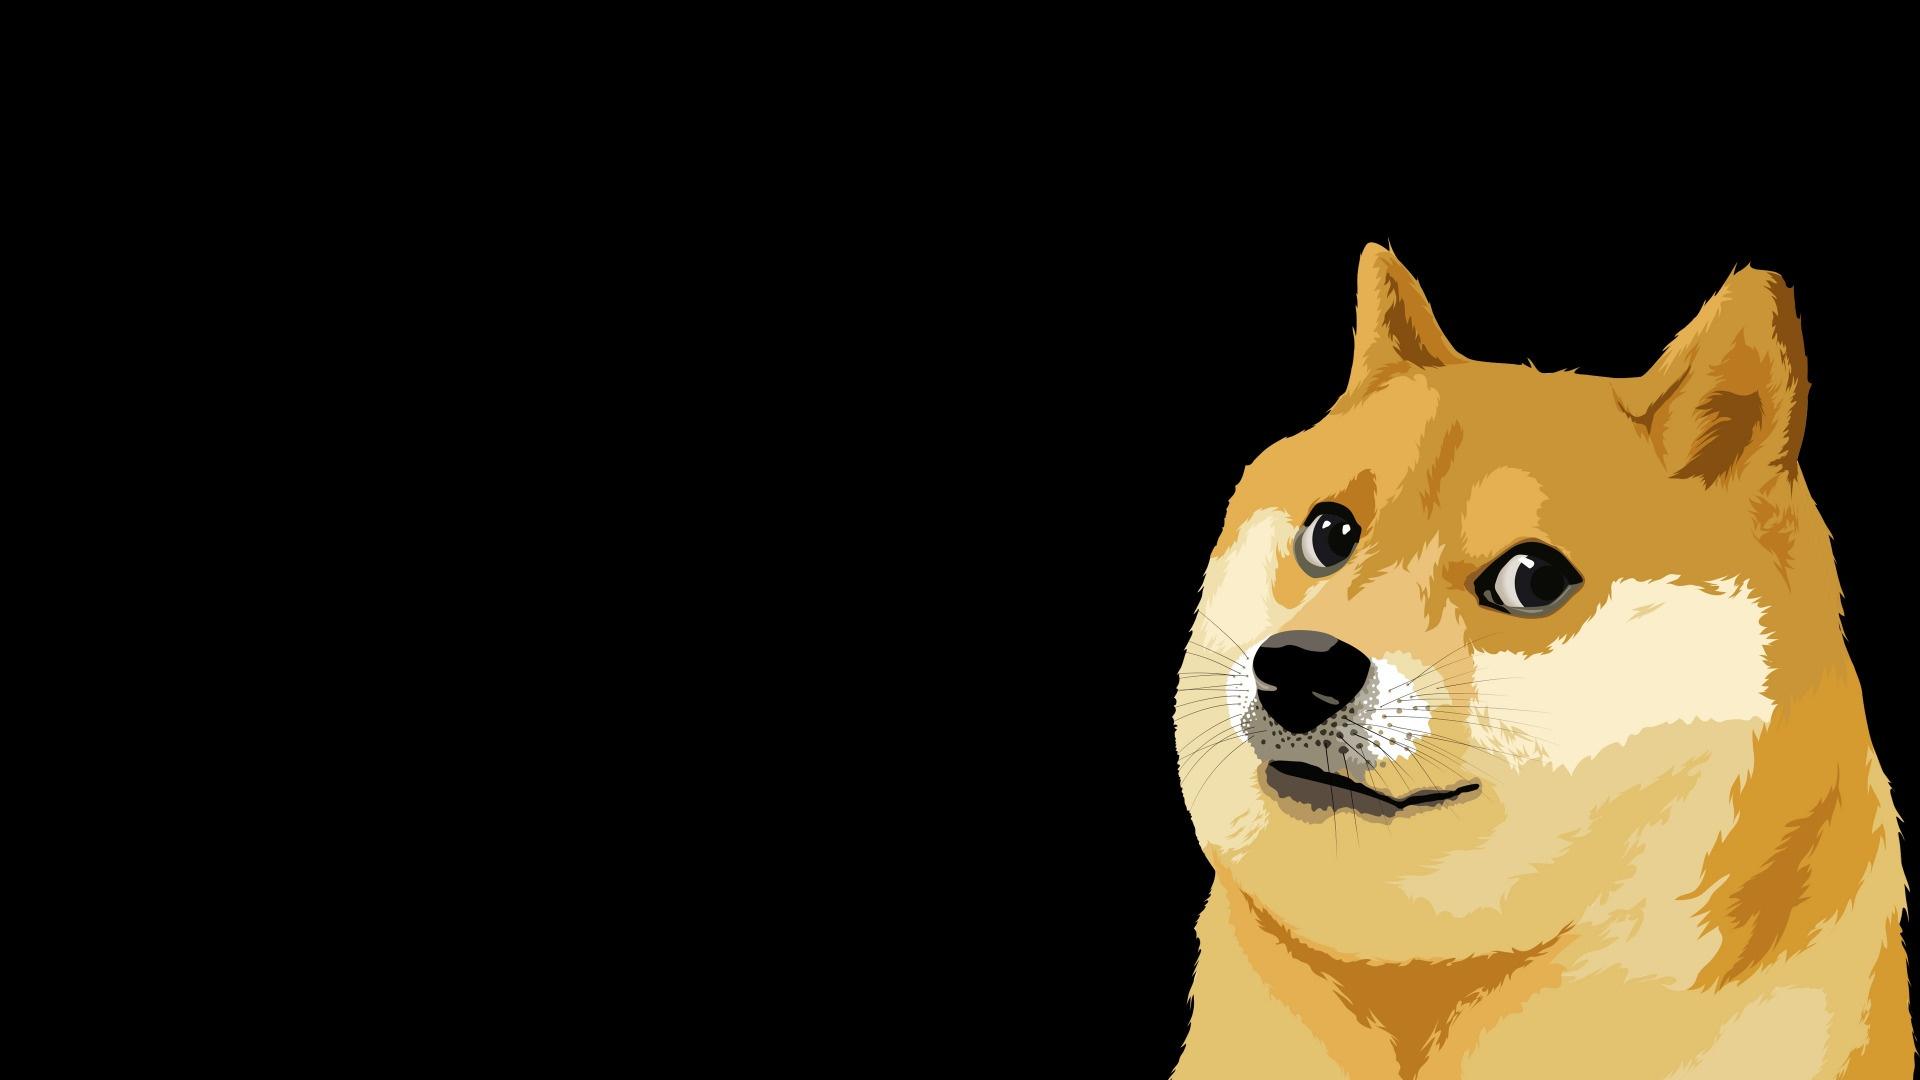 Doge Meme best wallpaper